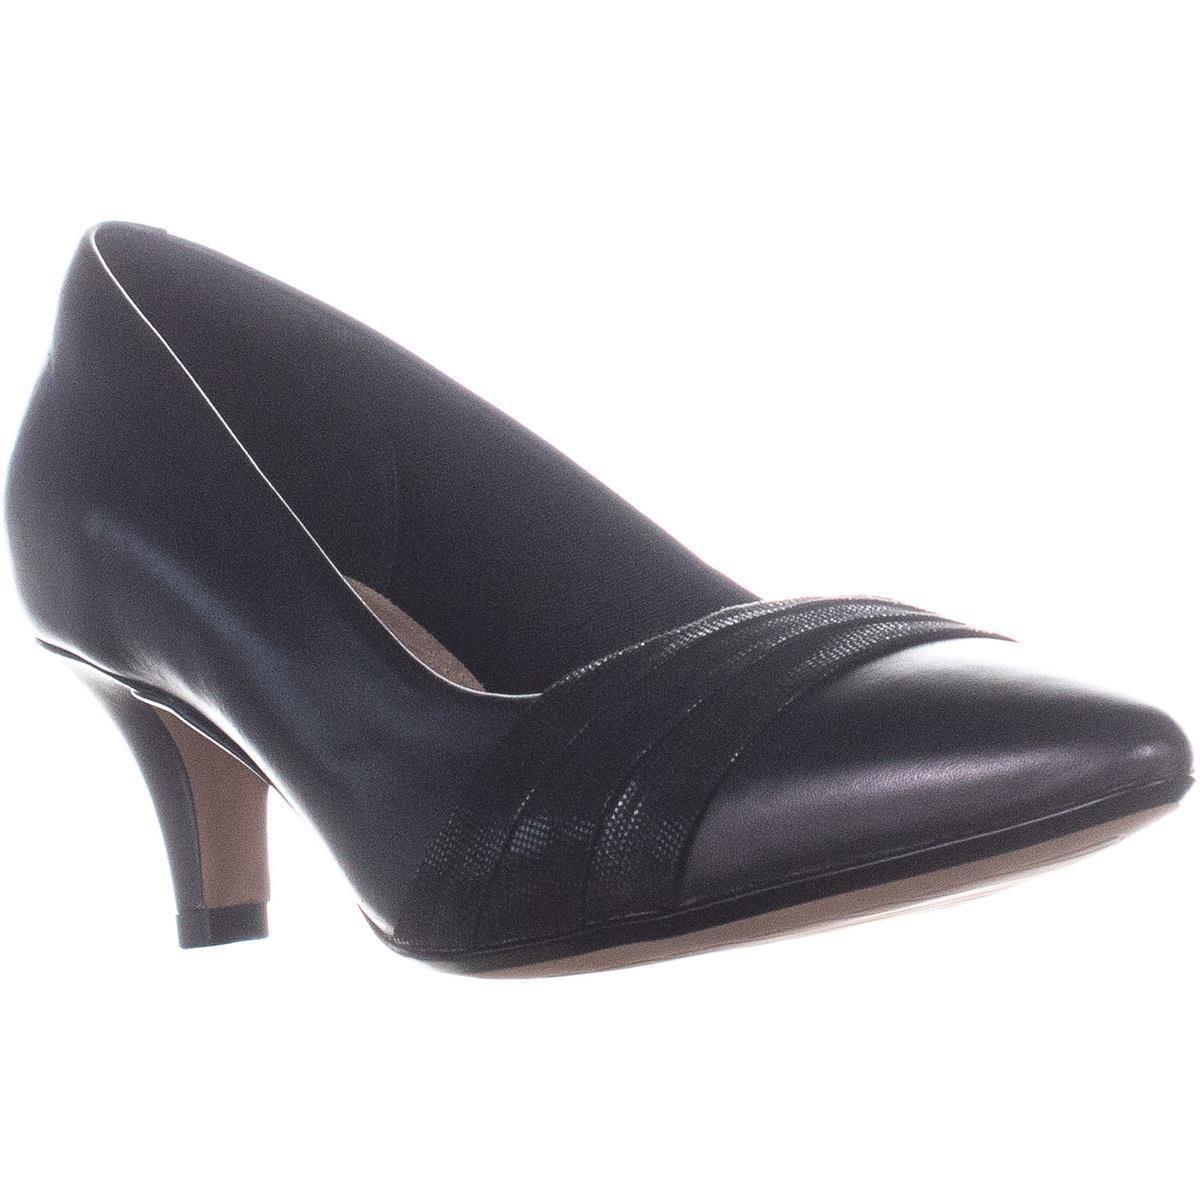 c264d9f9ecc Clarks Linvale Madie Kitten Heels in Black - Lyst